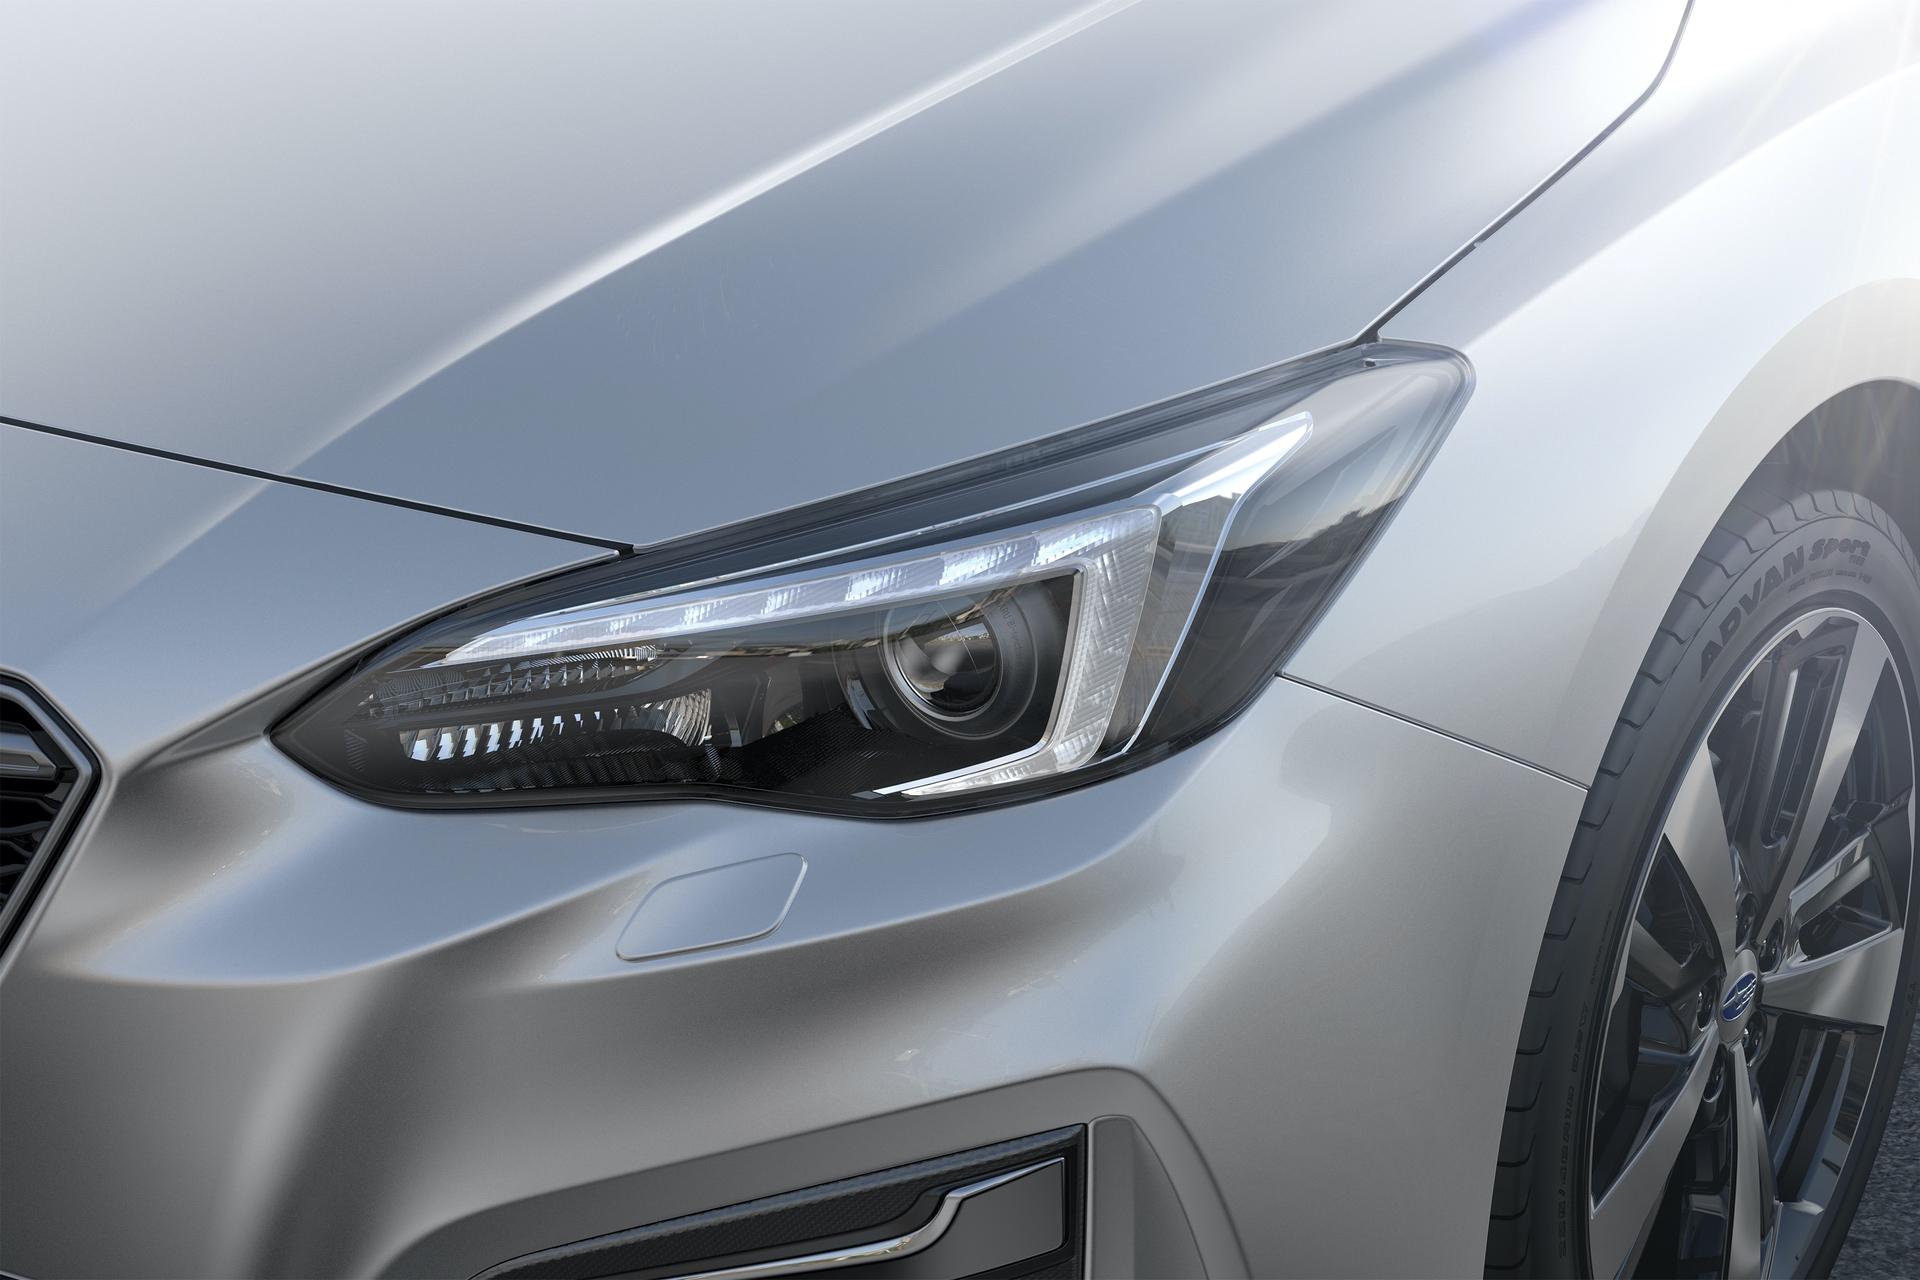 First_Drive_Subaru_Impreza_0022